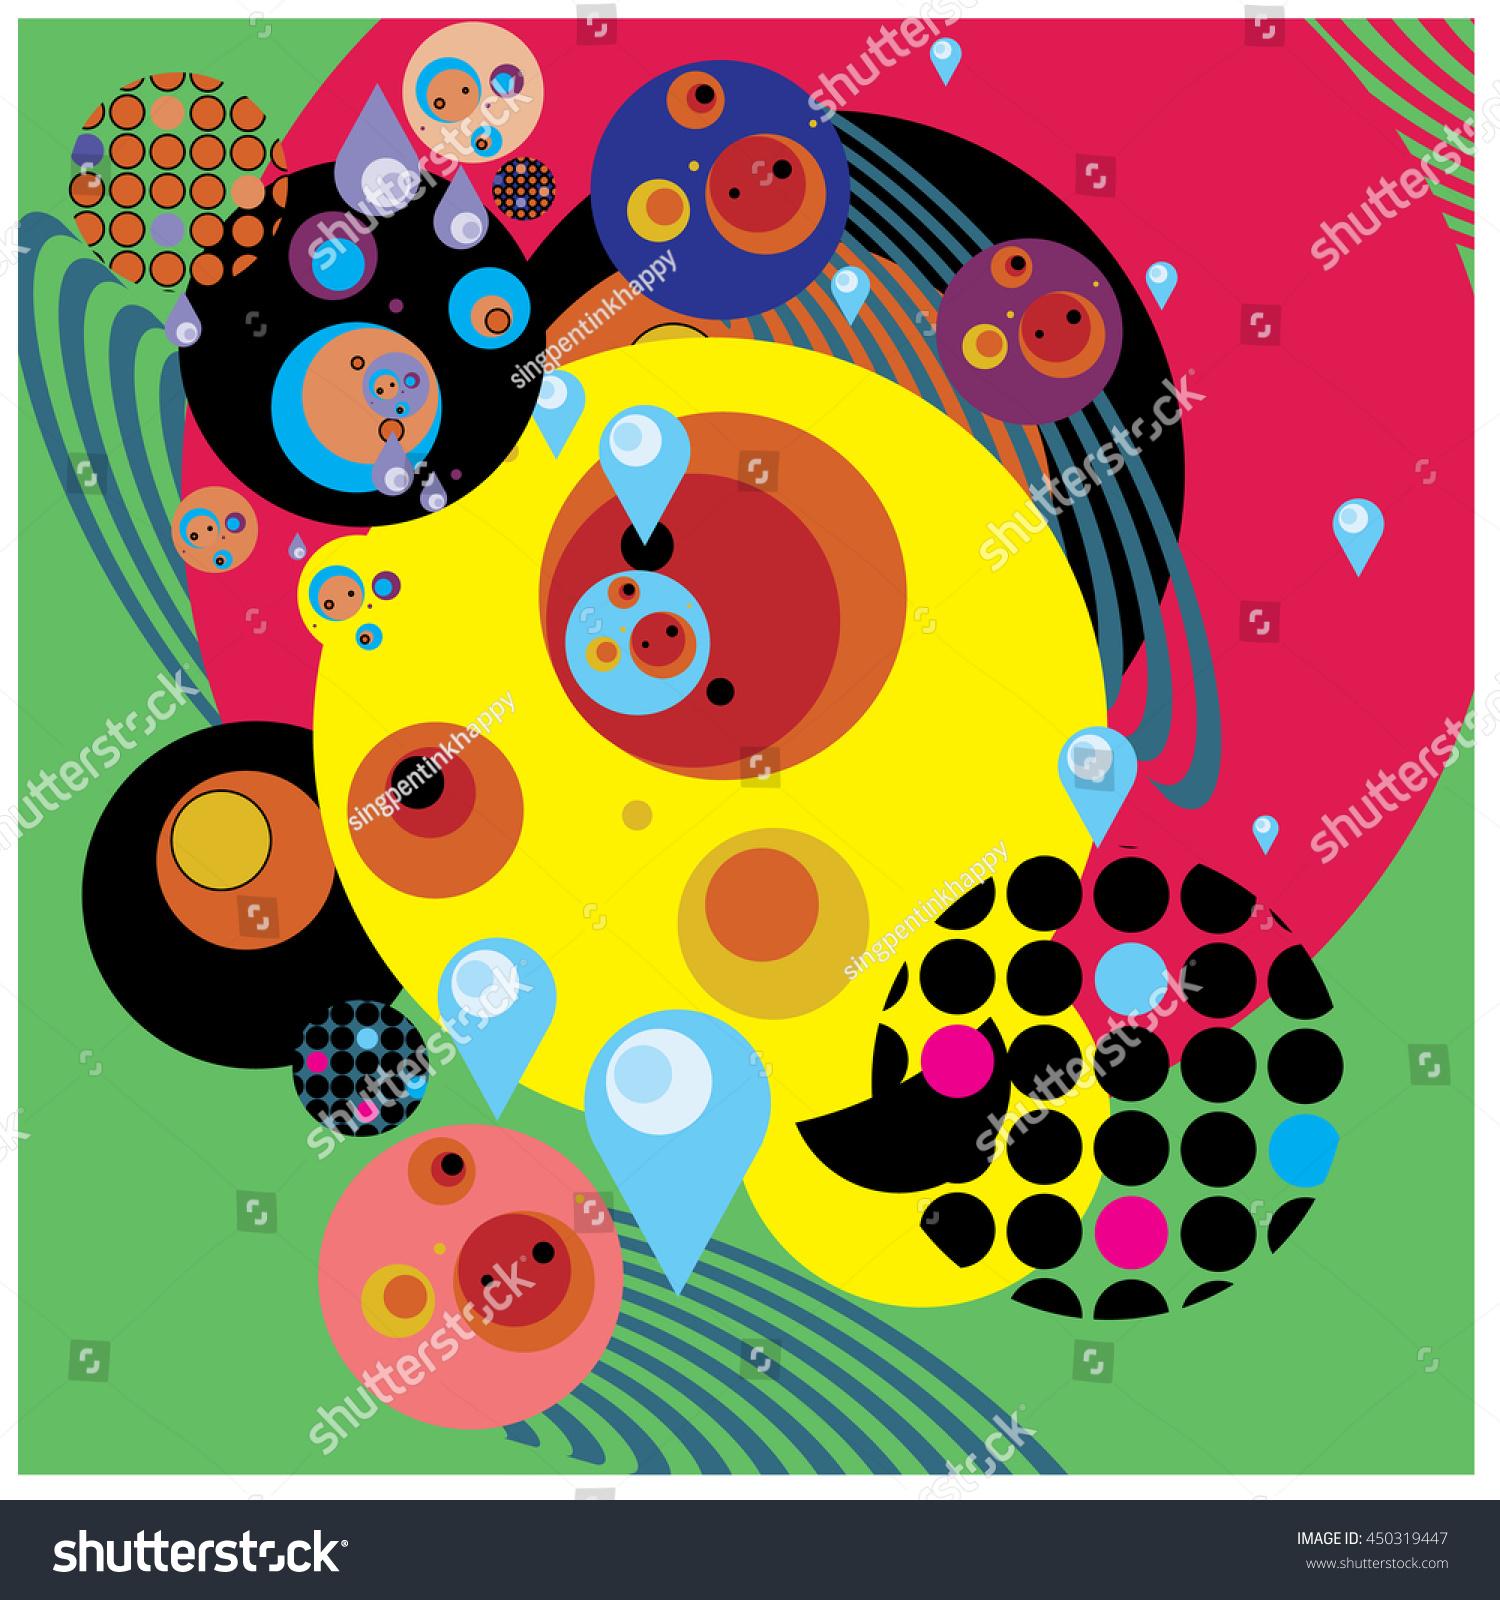 Vector Fabric Circles Abstract Colorful Wallpaper Stock Vector ...